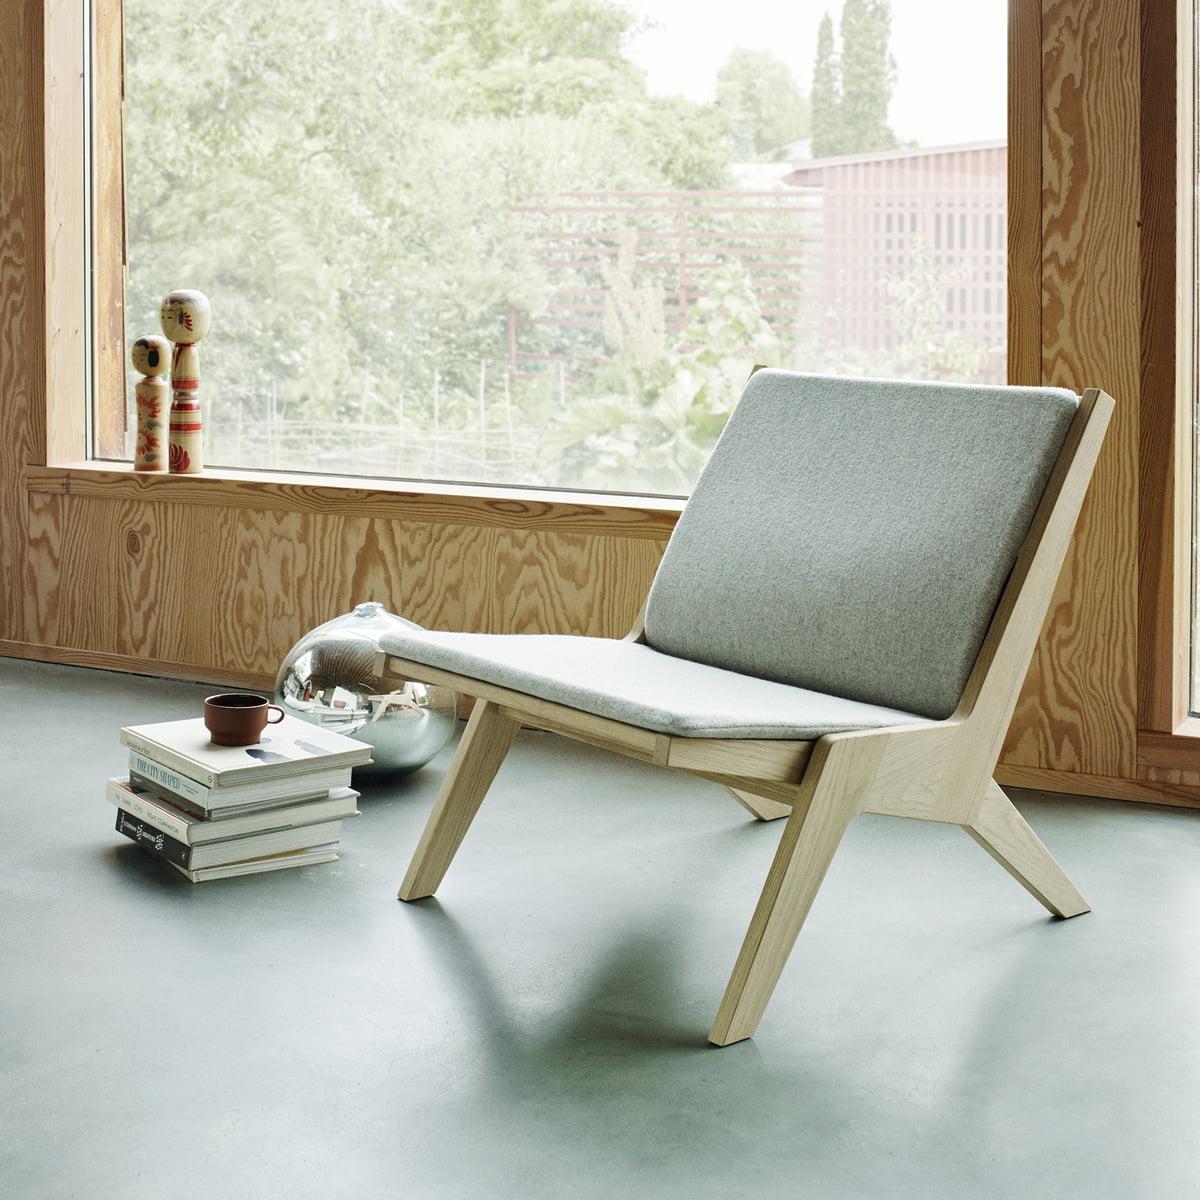 Miskito Lounge Chair by Skagerak in Oak / Light Grey & Miskito Lounge Chair by Skagerak in the shop